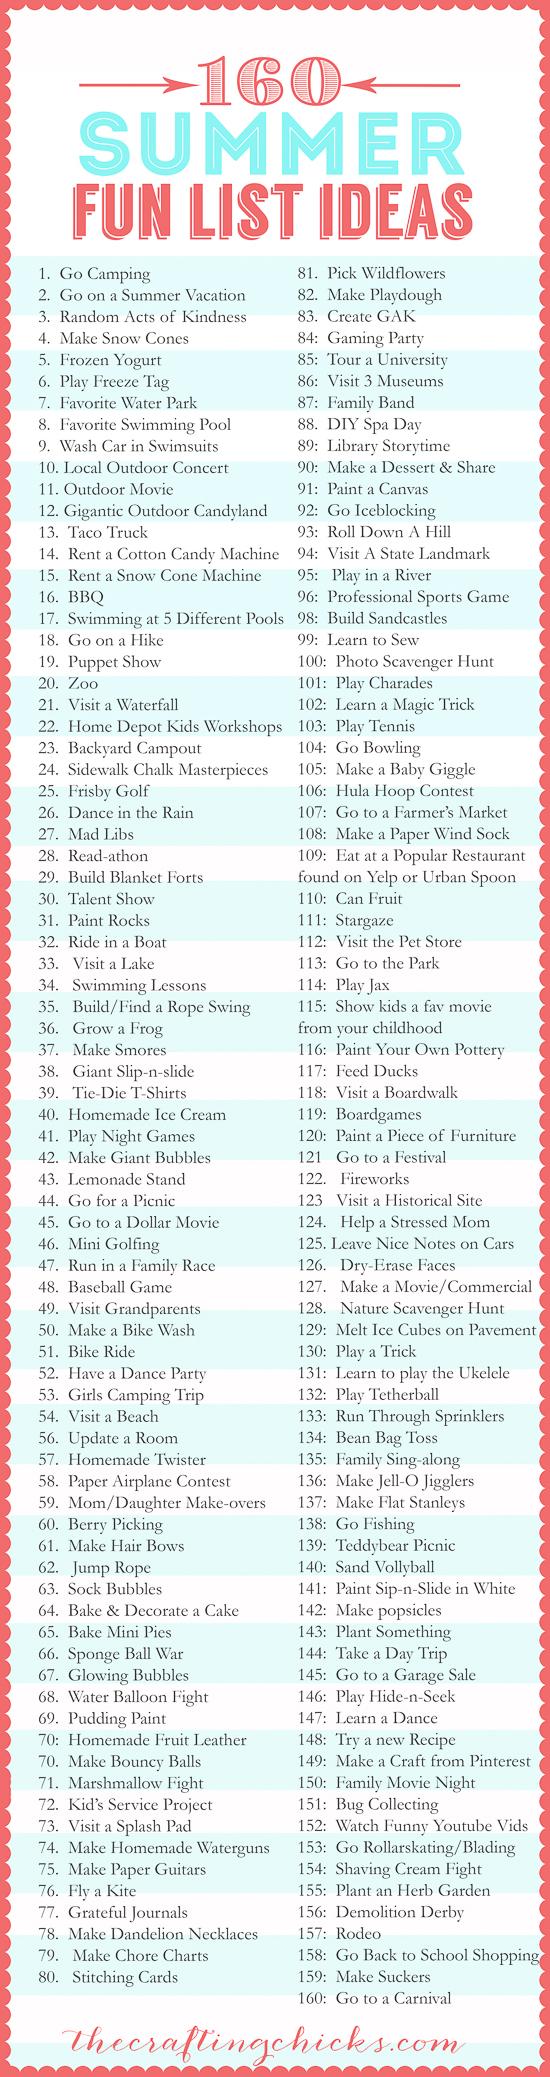 160-Summer-Fun-List-Ideas